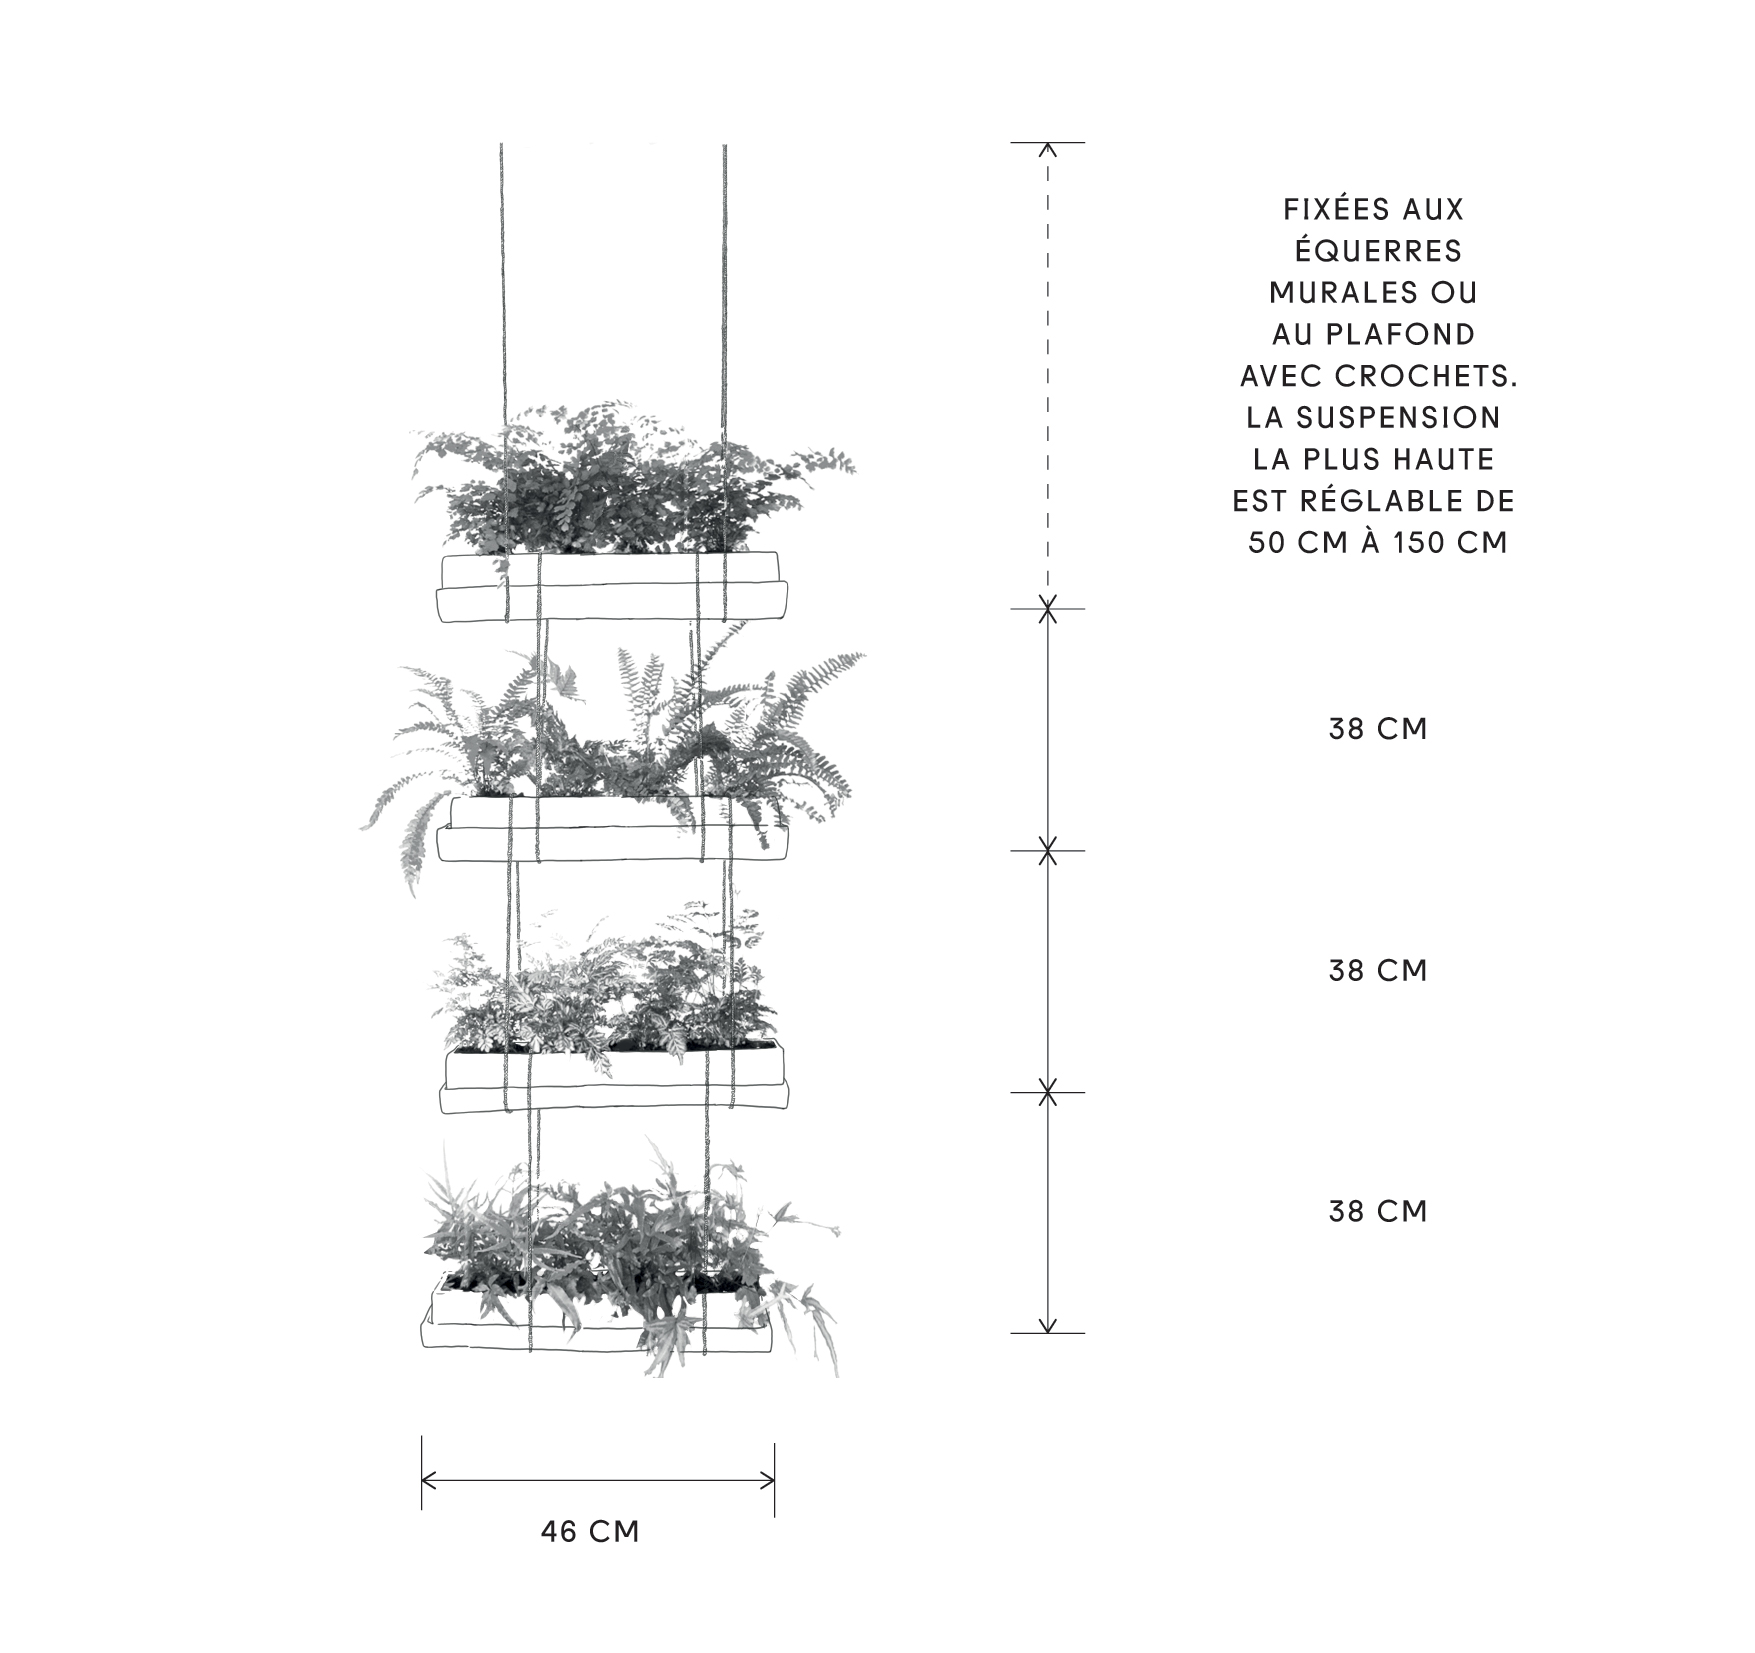 mesures_suspension.jpg